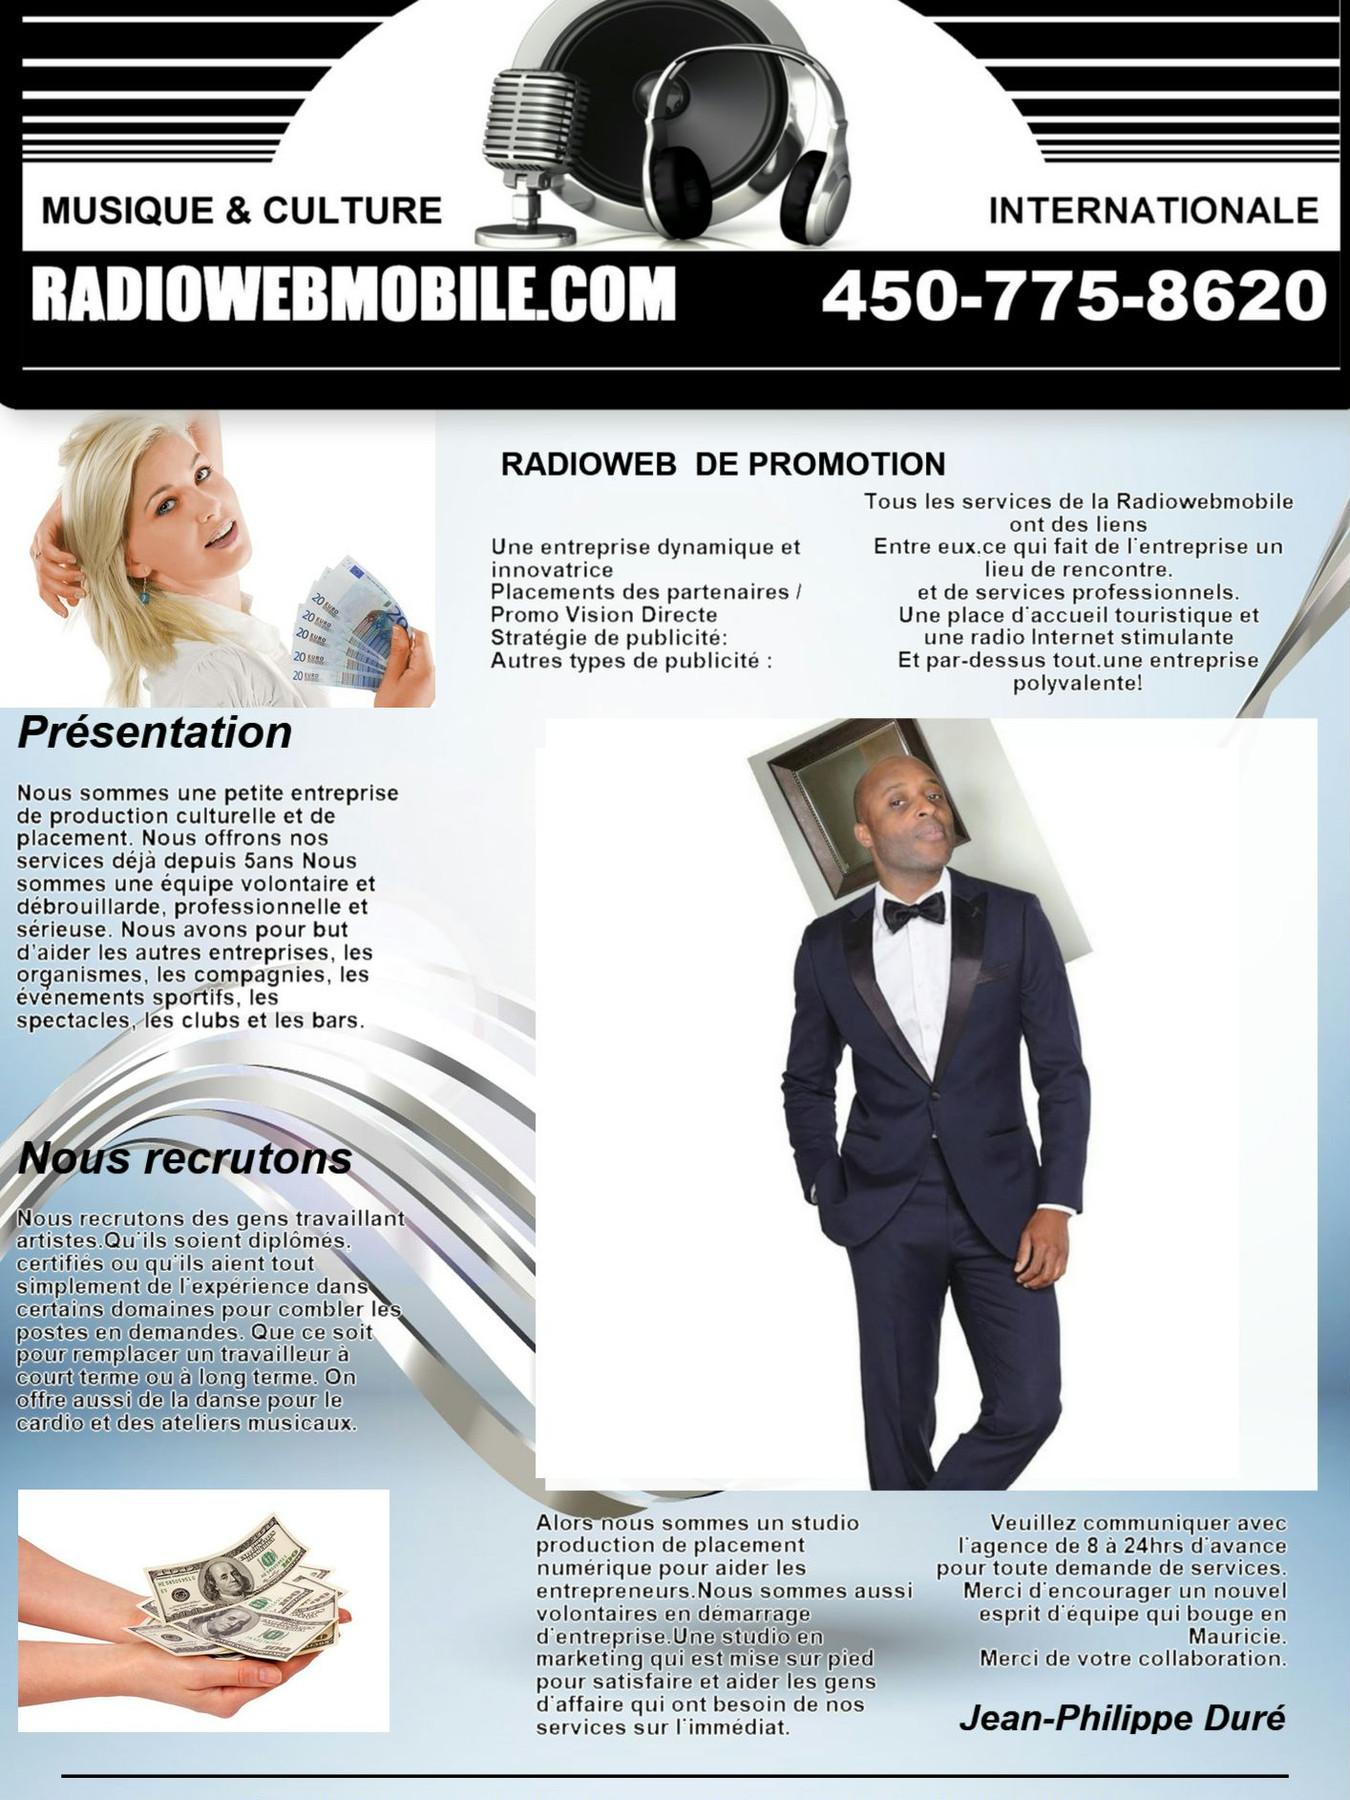 MaG Radioweb